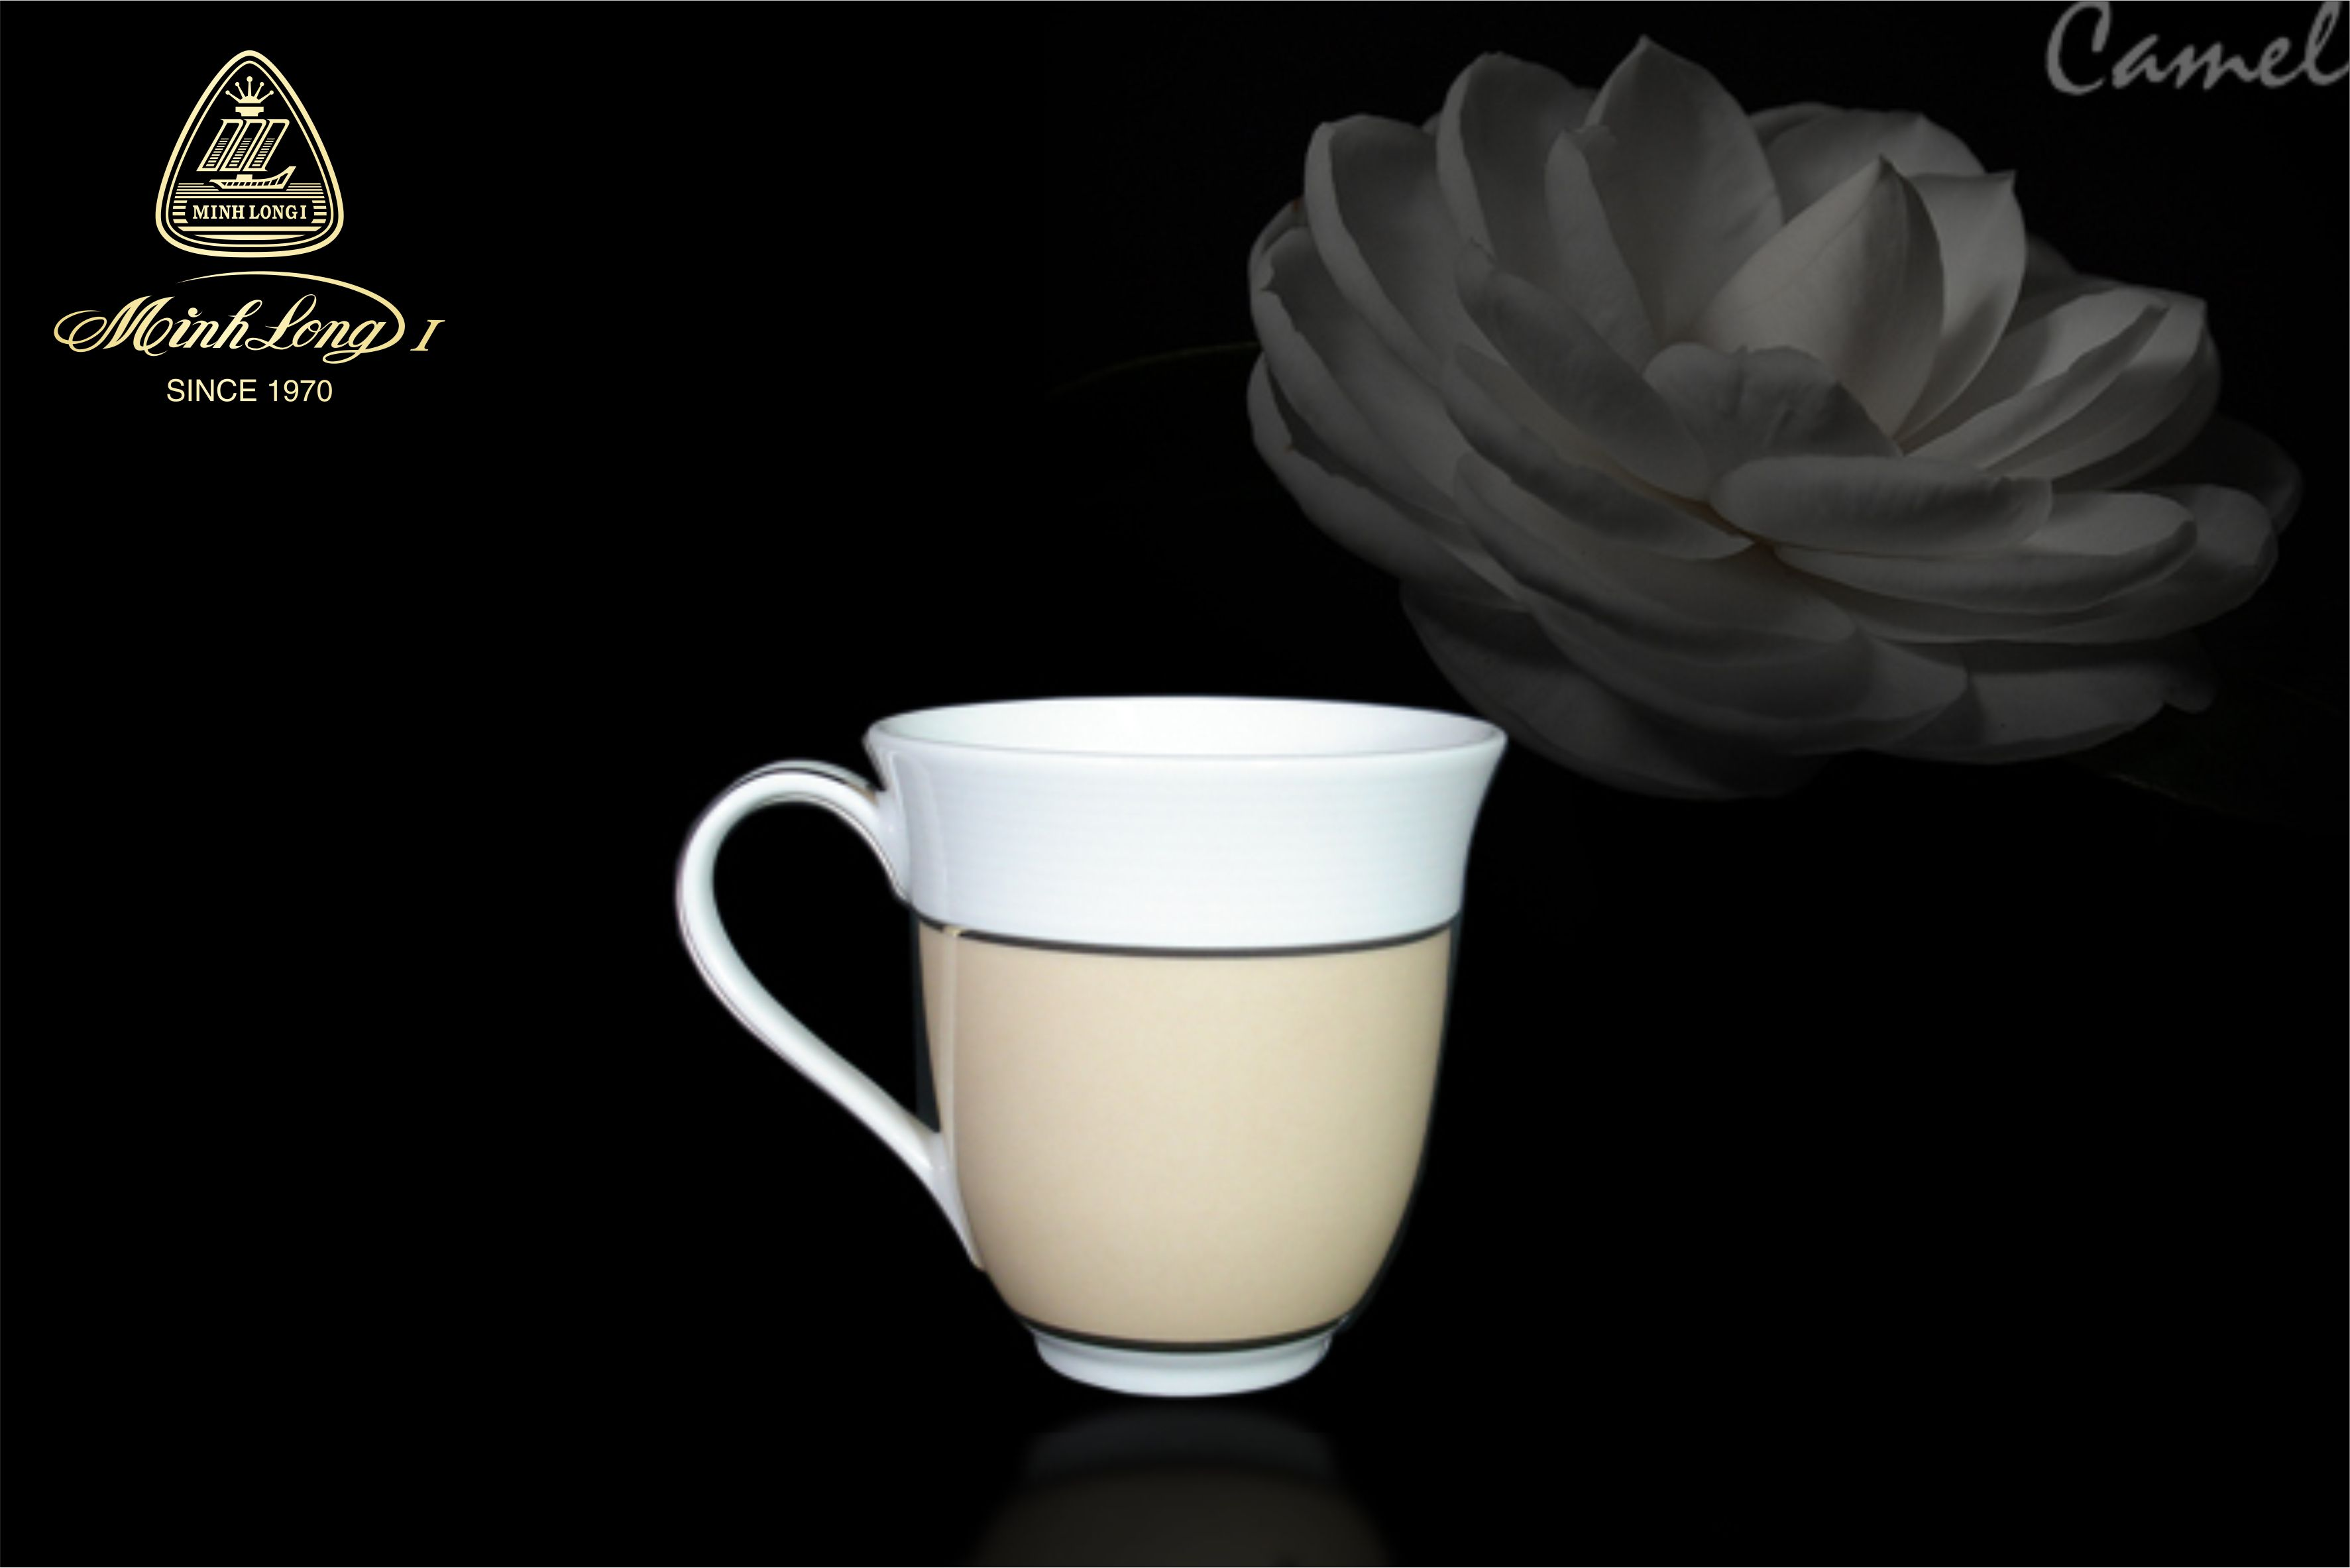 Ca sọc 0.4L Came Màu Cafe Sữa 154040317 Minh Long